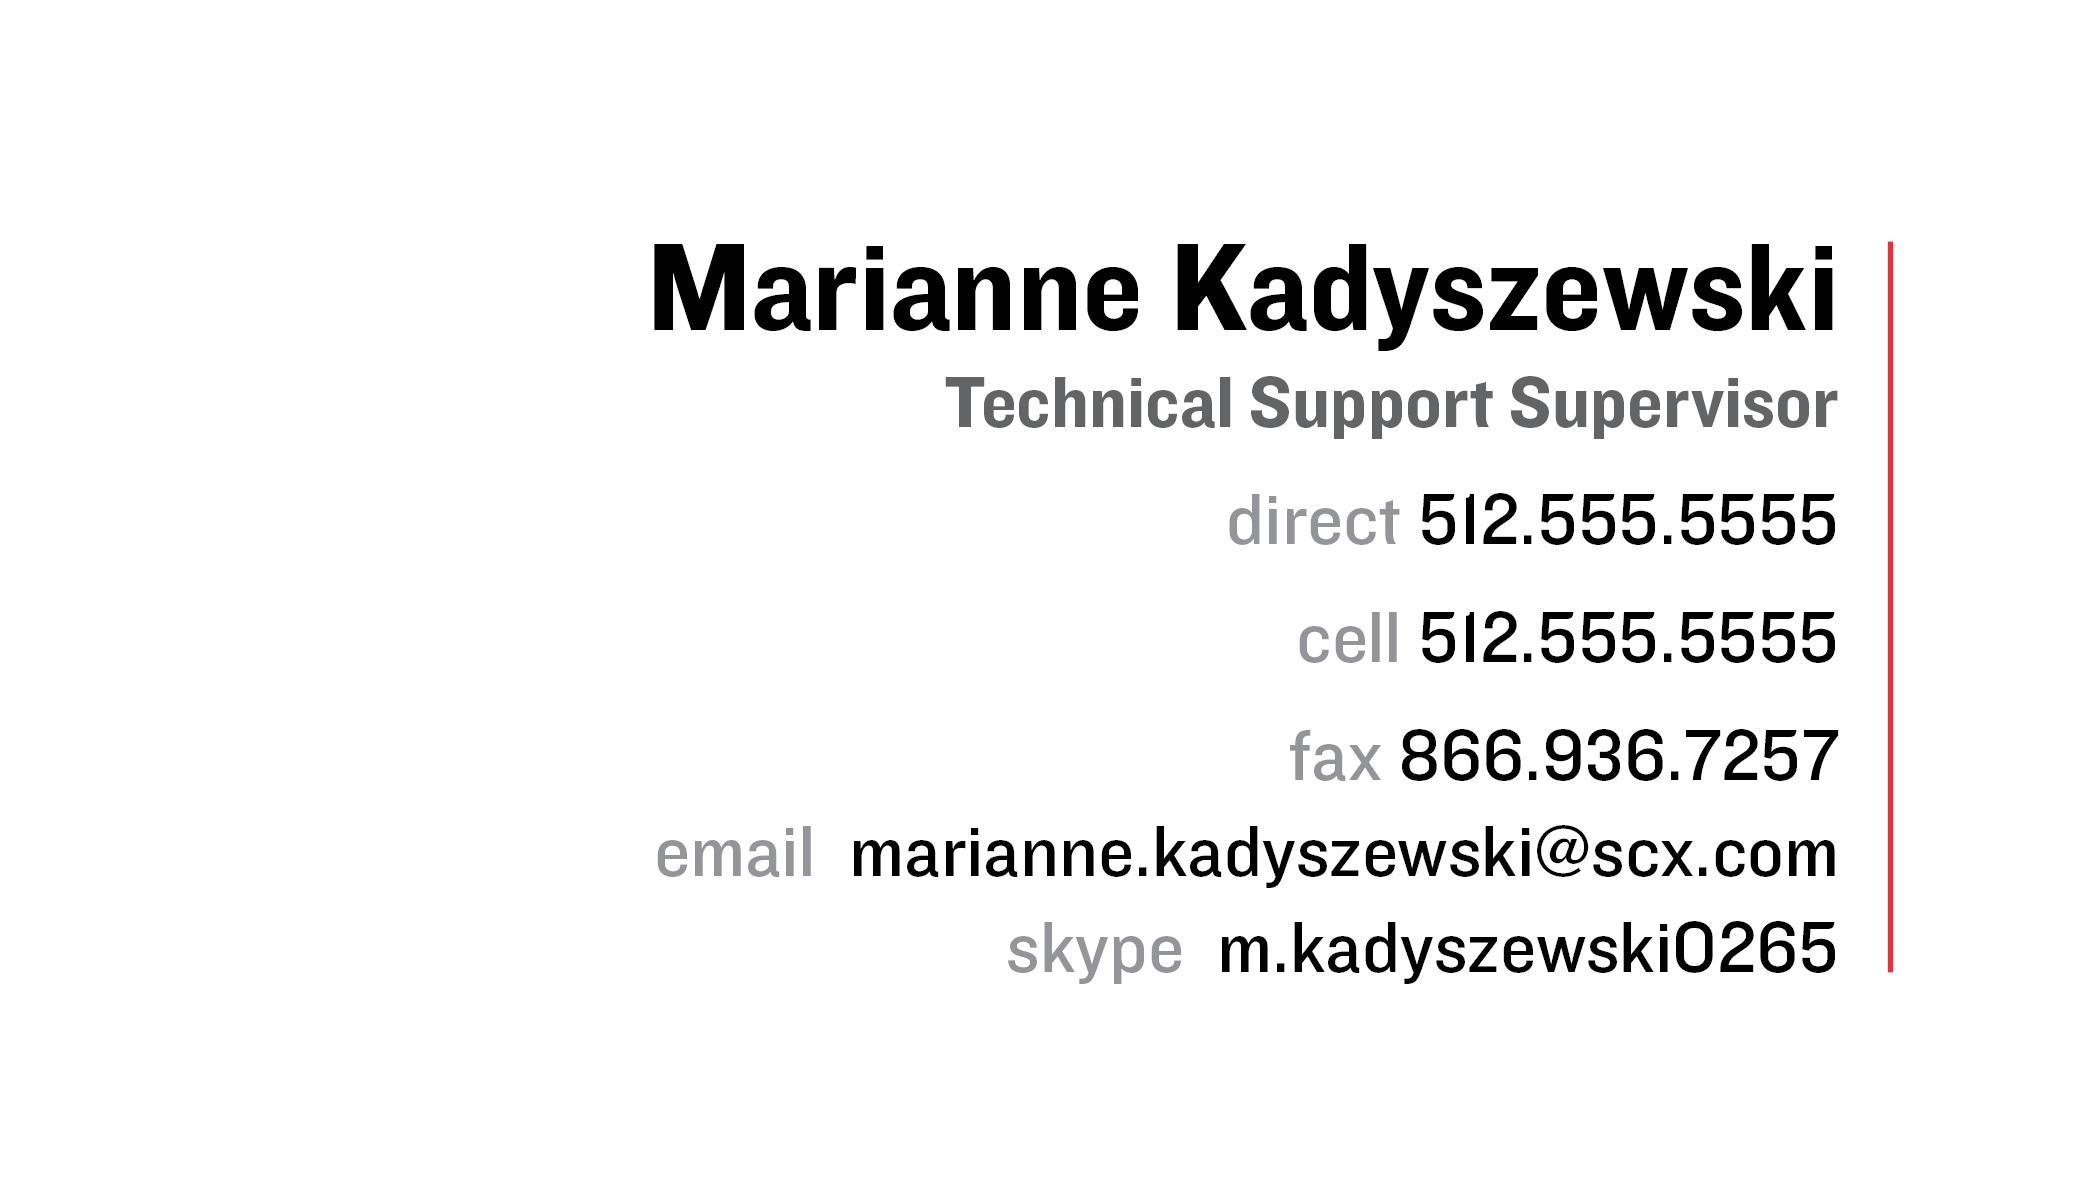 SC business card design concepts3.jpg